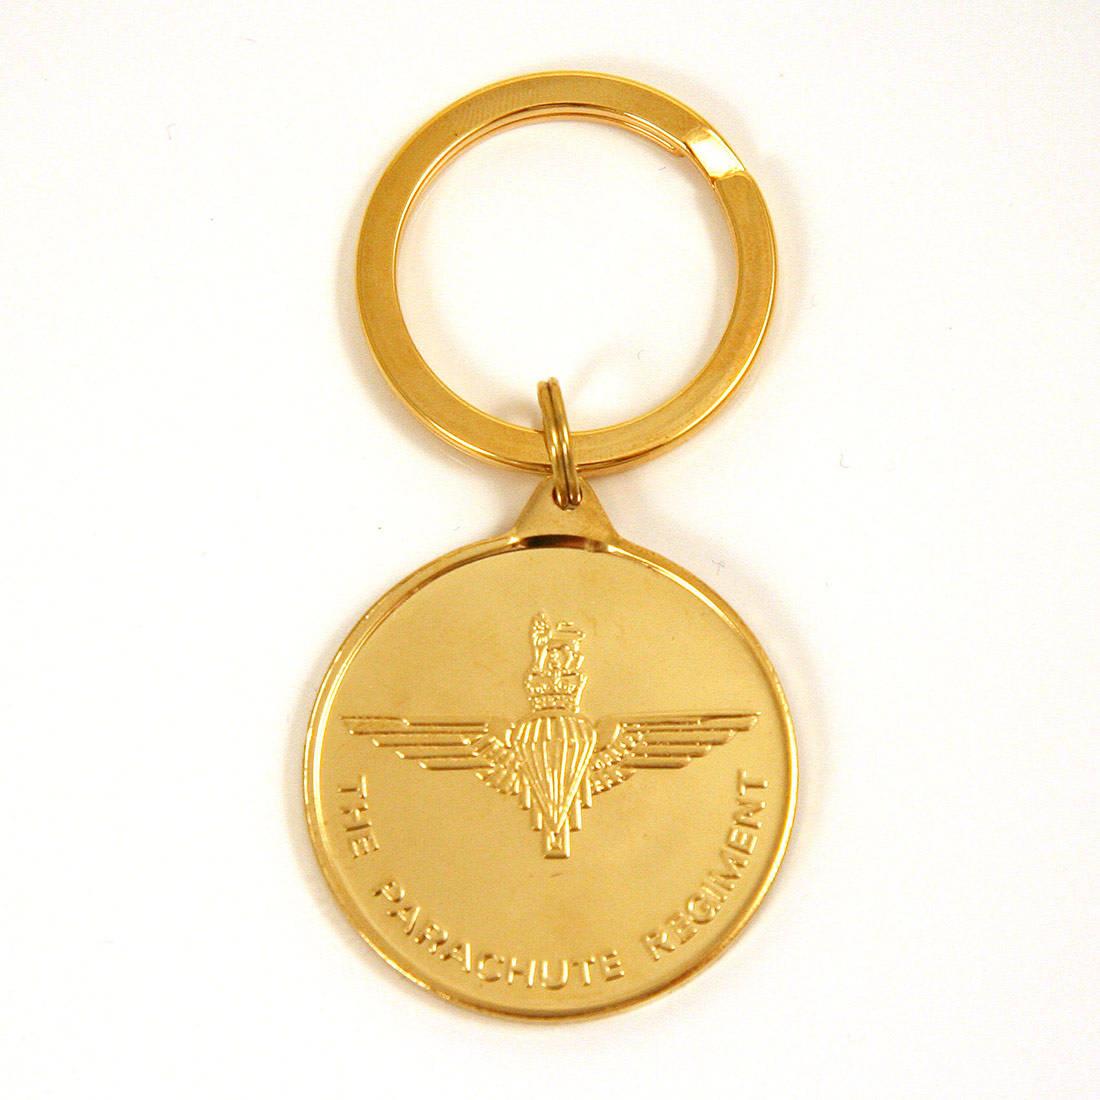 Medallion Key Ring, Para & Pegasus 22ct Gold Plated